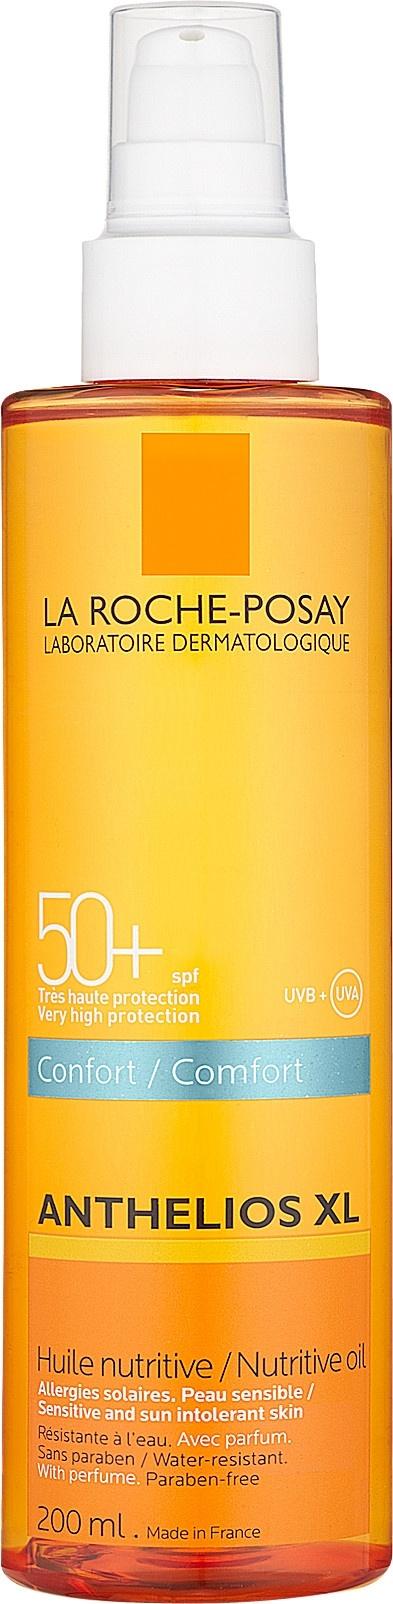 La Roche-Posay Anthelios XL Comfort Nutritive Oil SPF50+ 200ml